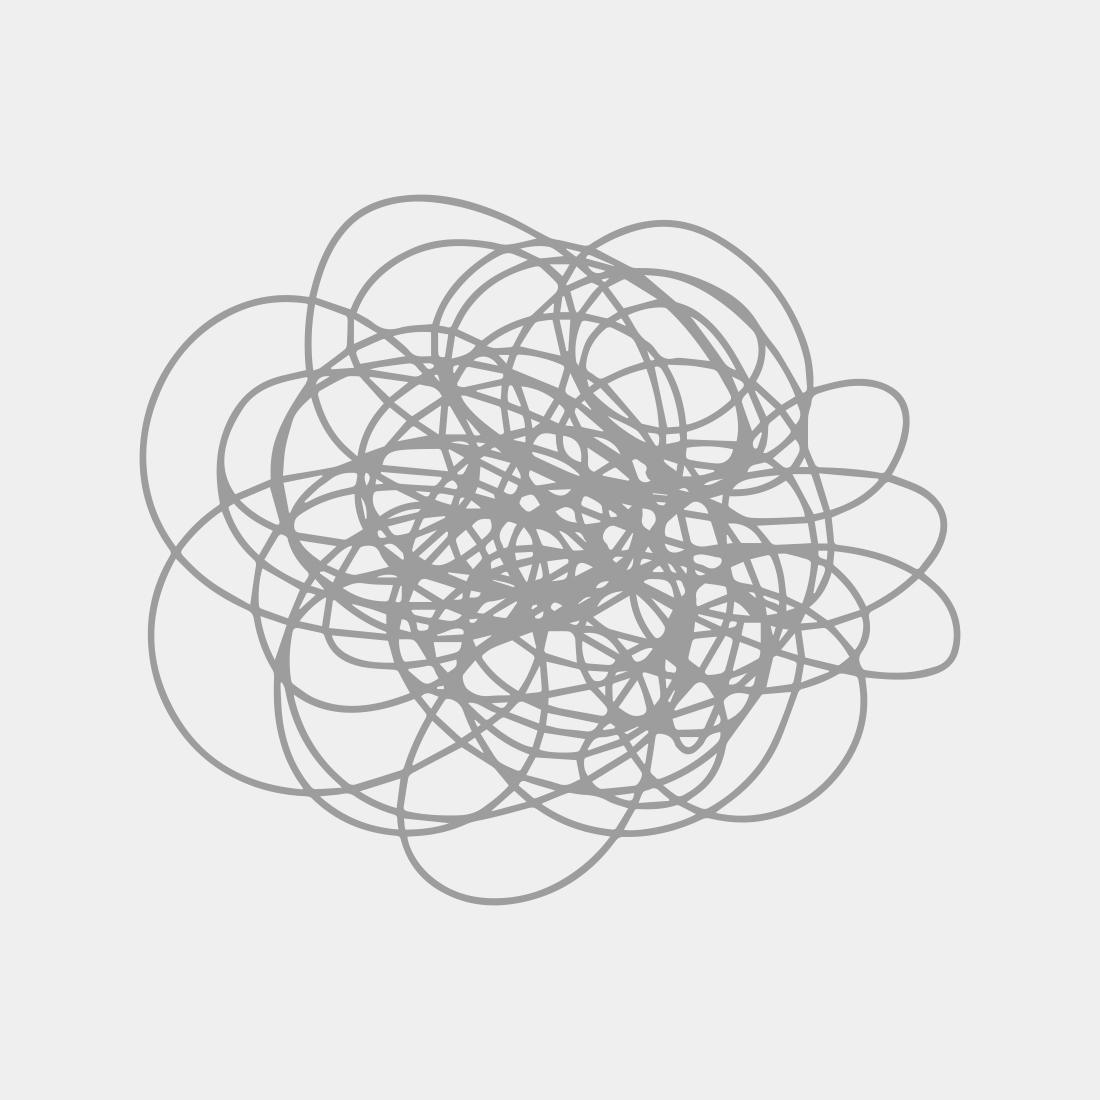 Aino-Maija Metsola RA Edition Print